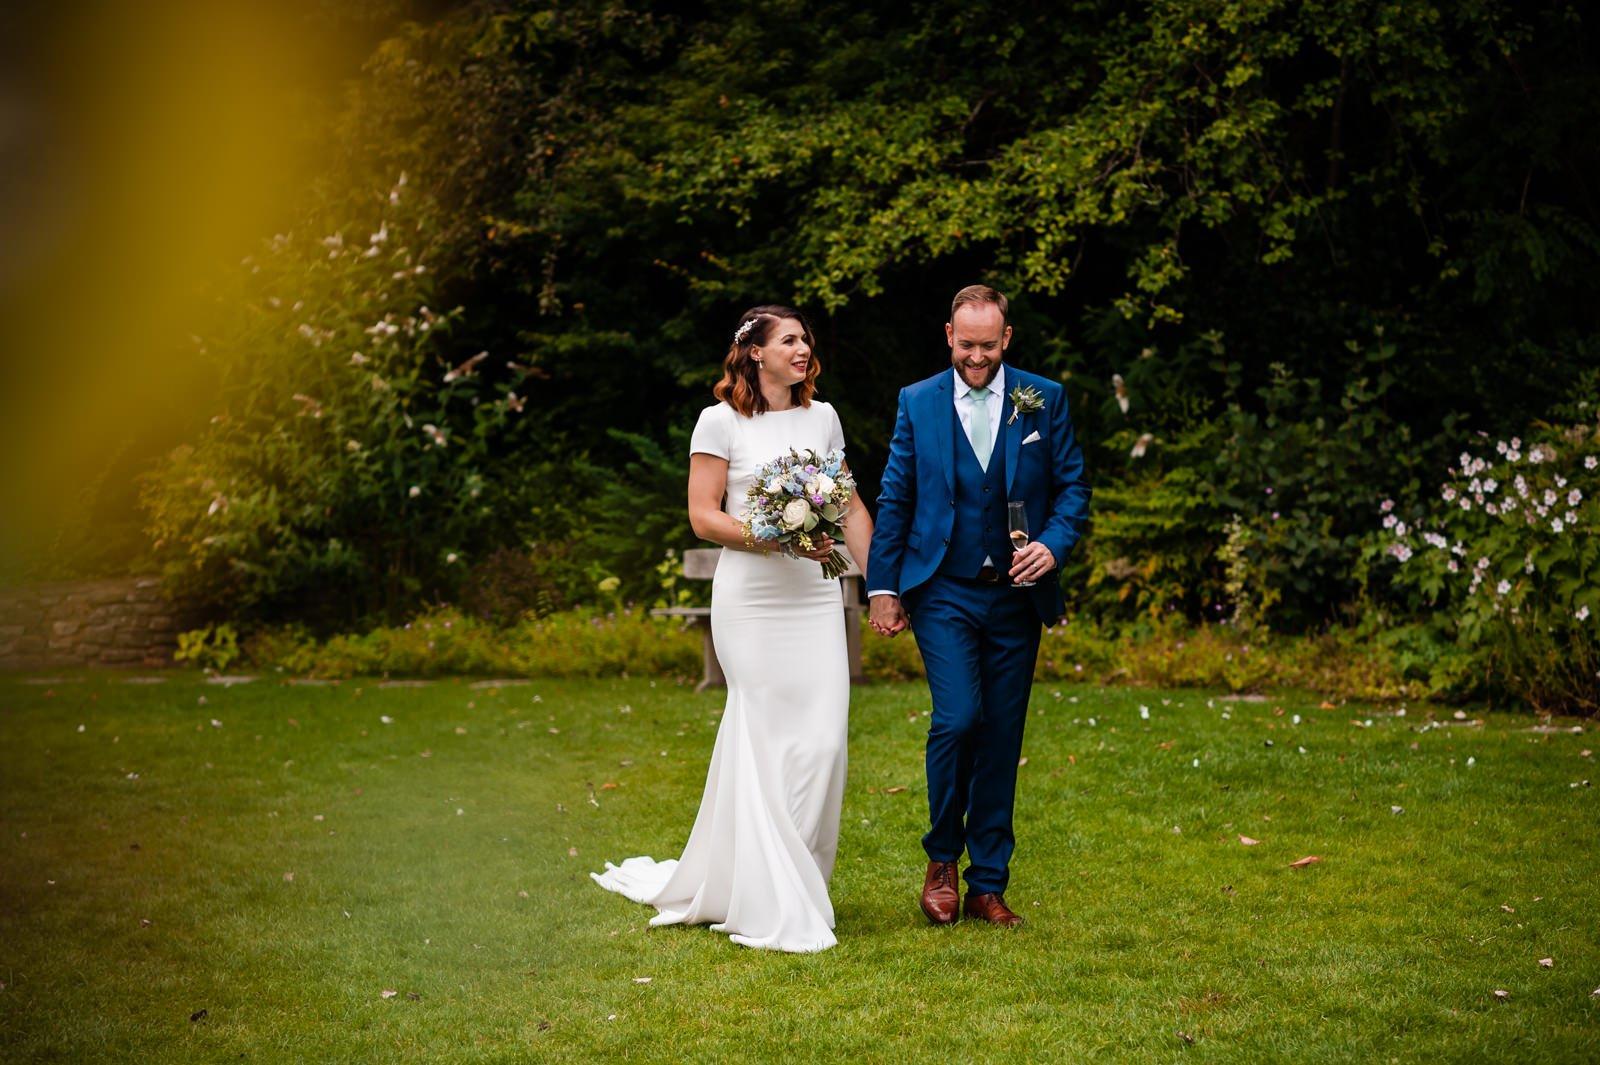 Millbridge Court Wedding - stunning summer wedding - wedding photography 80